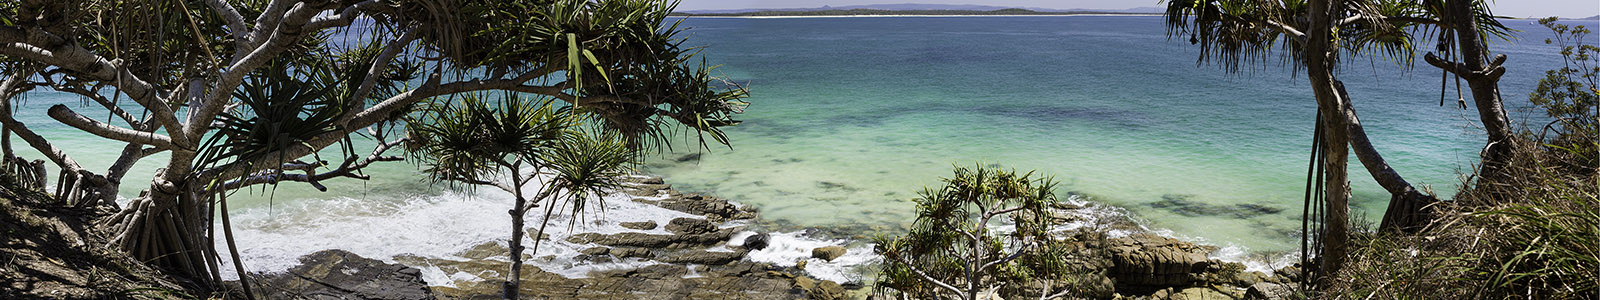 Australian Beach 7